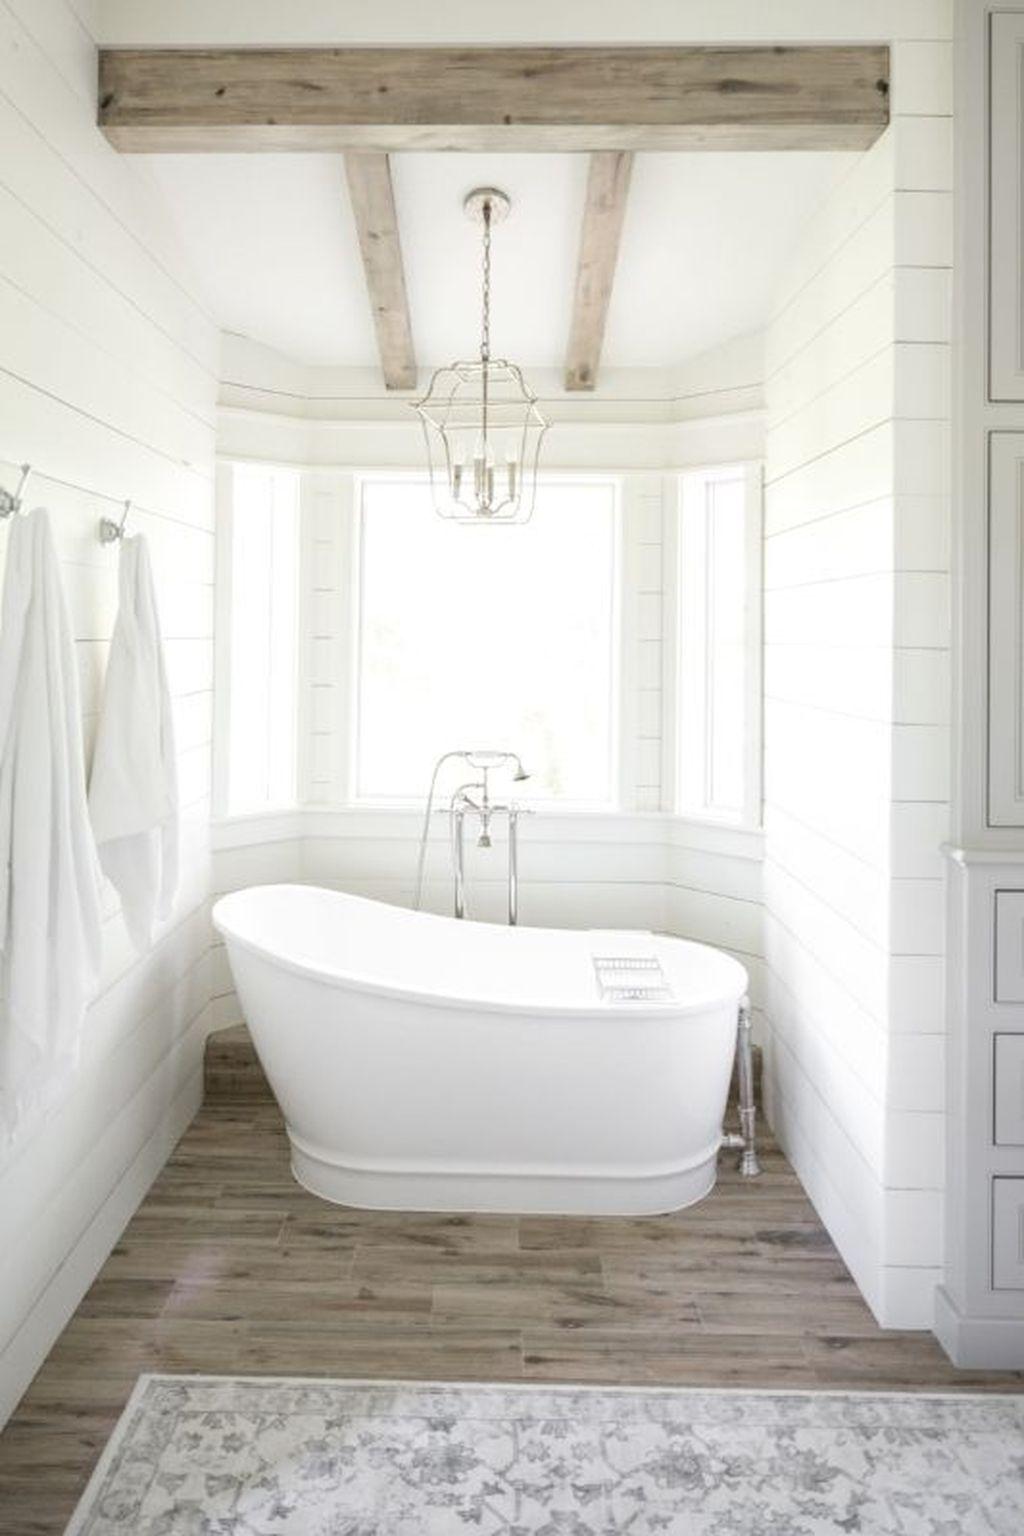 Modern farmhouse bathroom remodel ideas (68) | Home & Decor ...